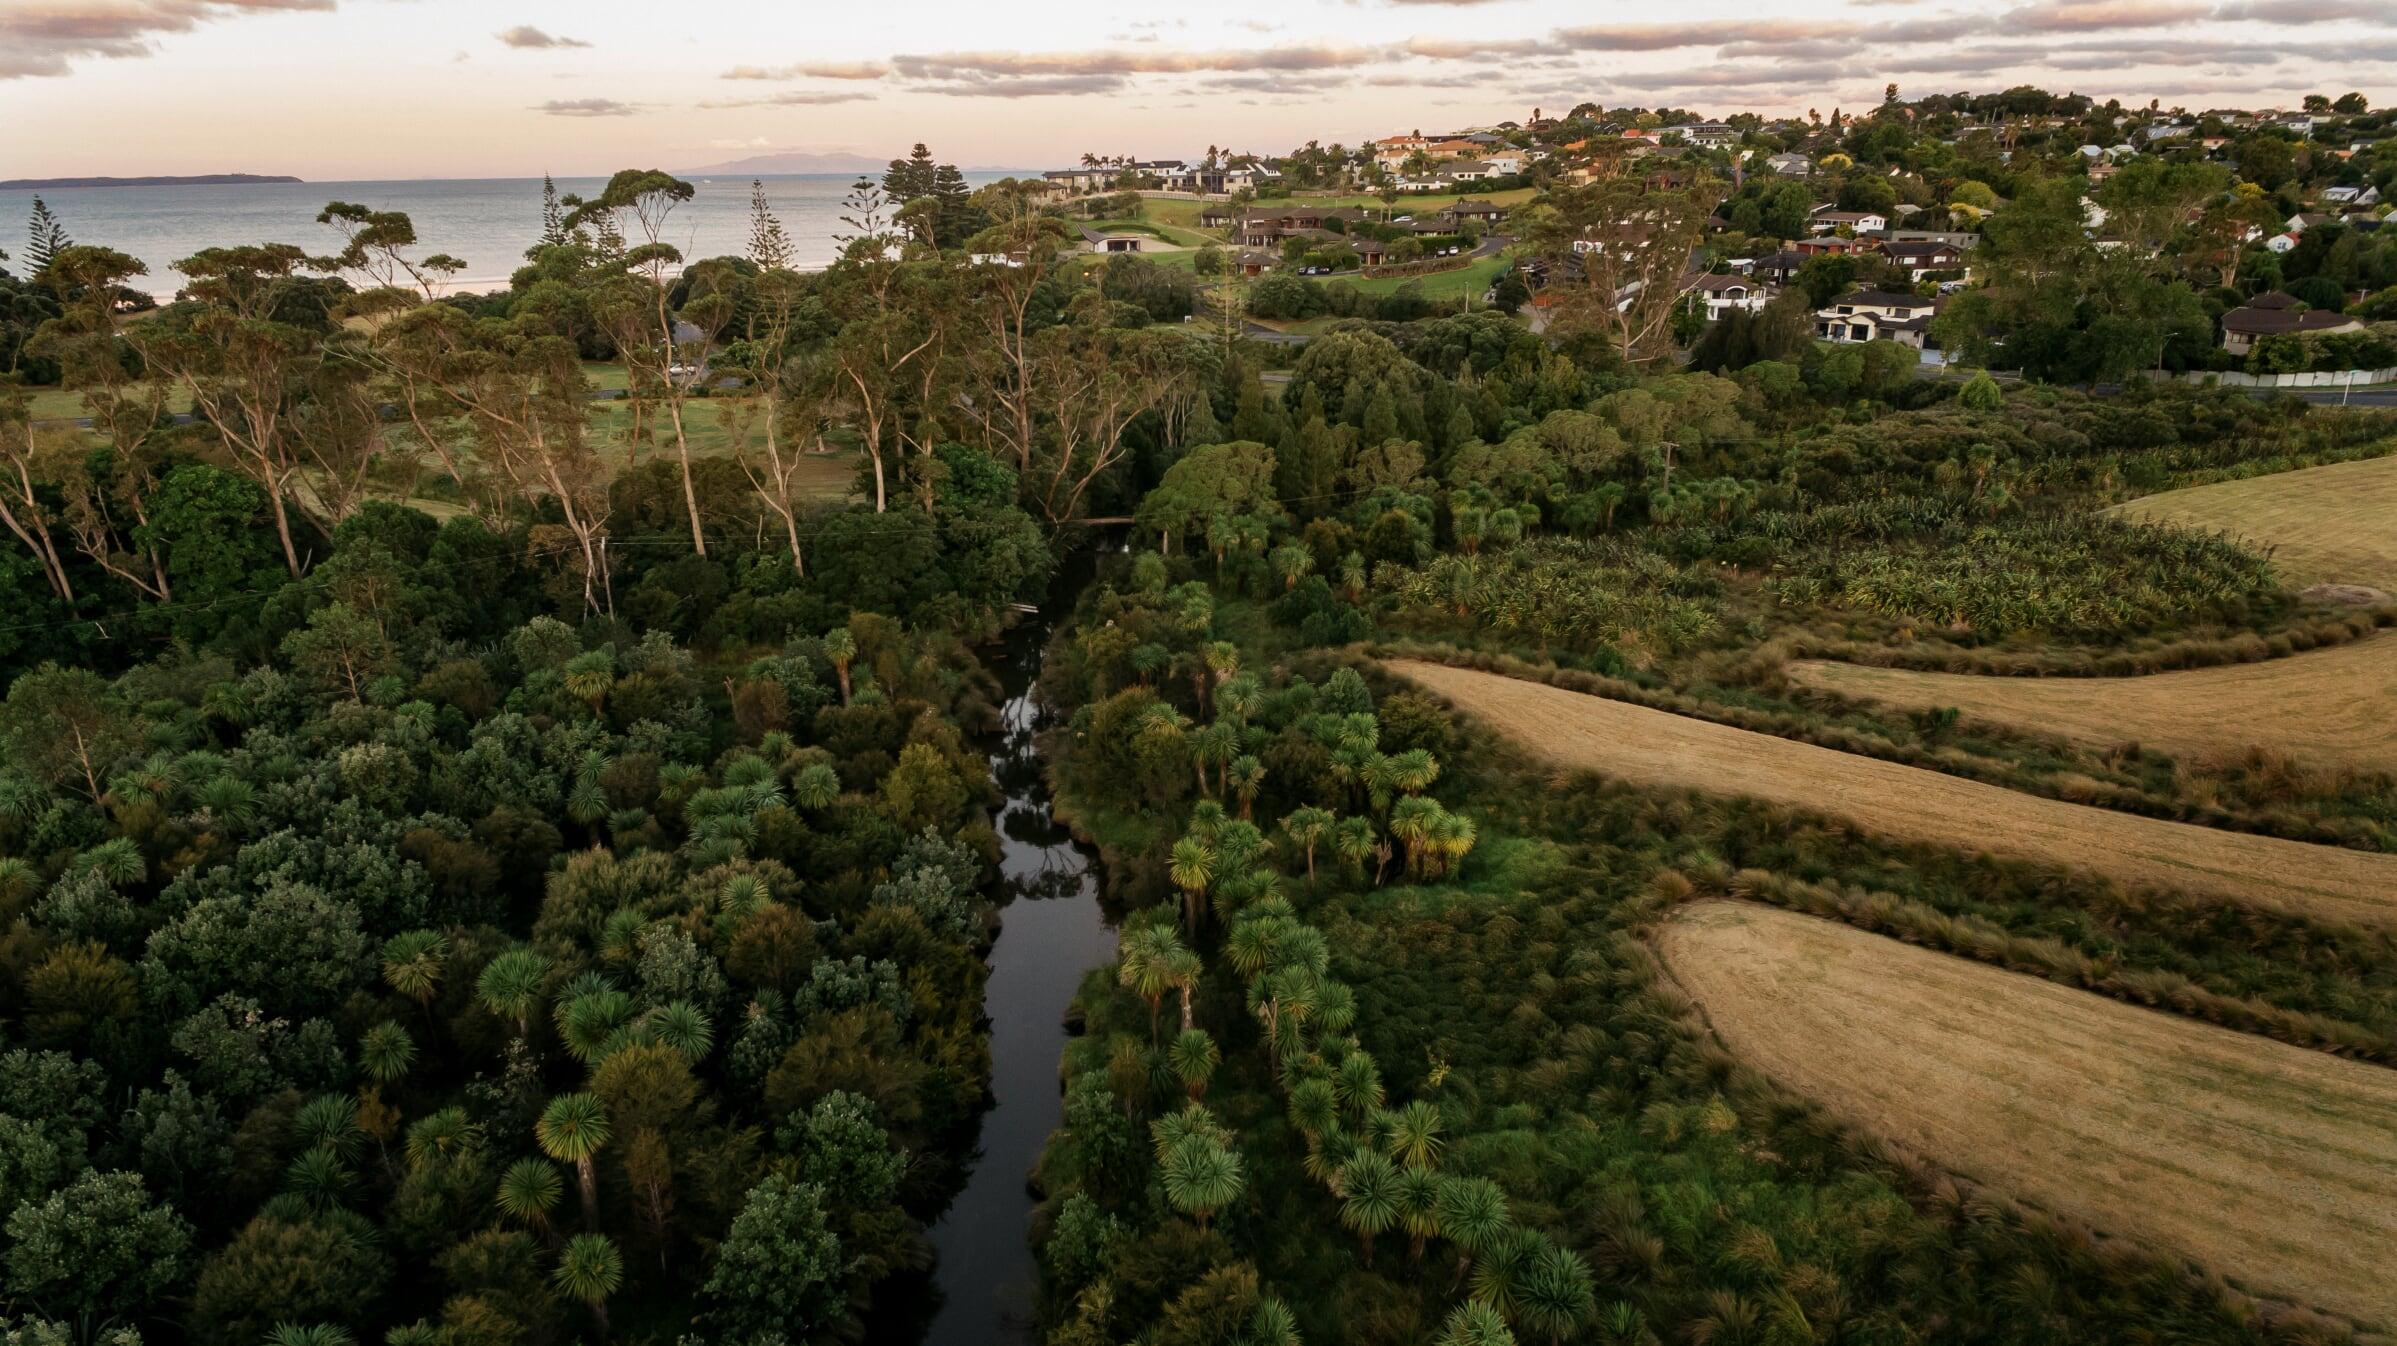 The development has a stunning natural environment.